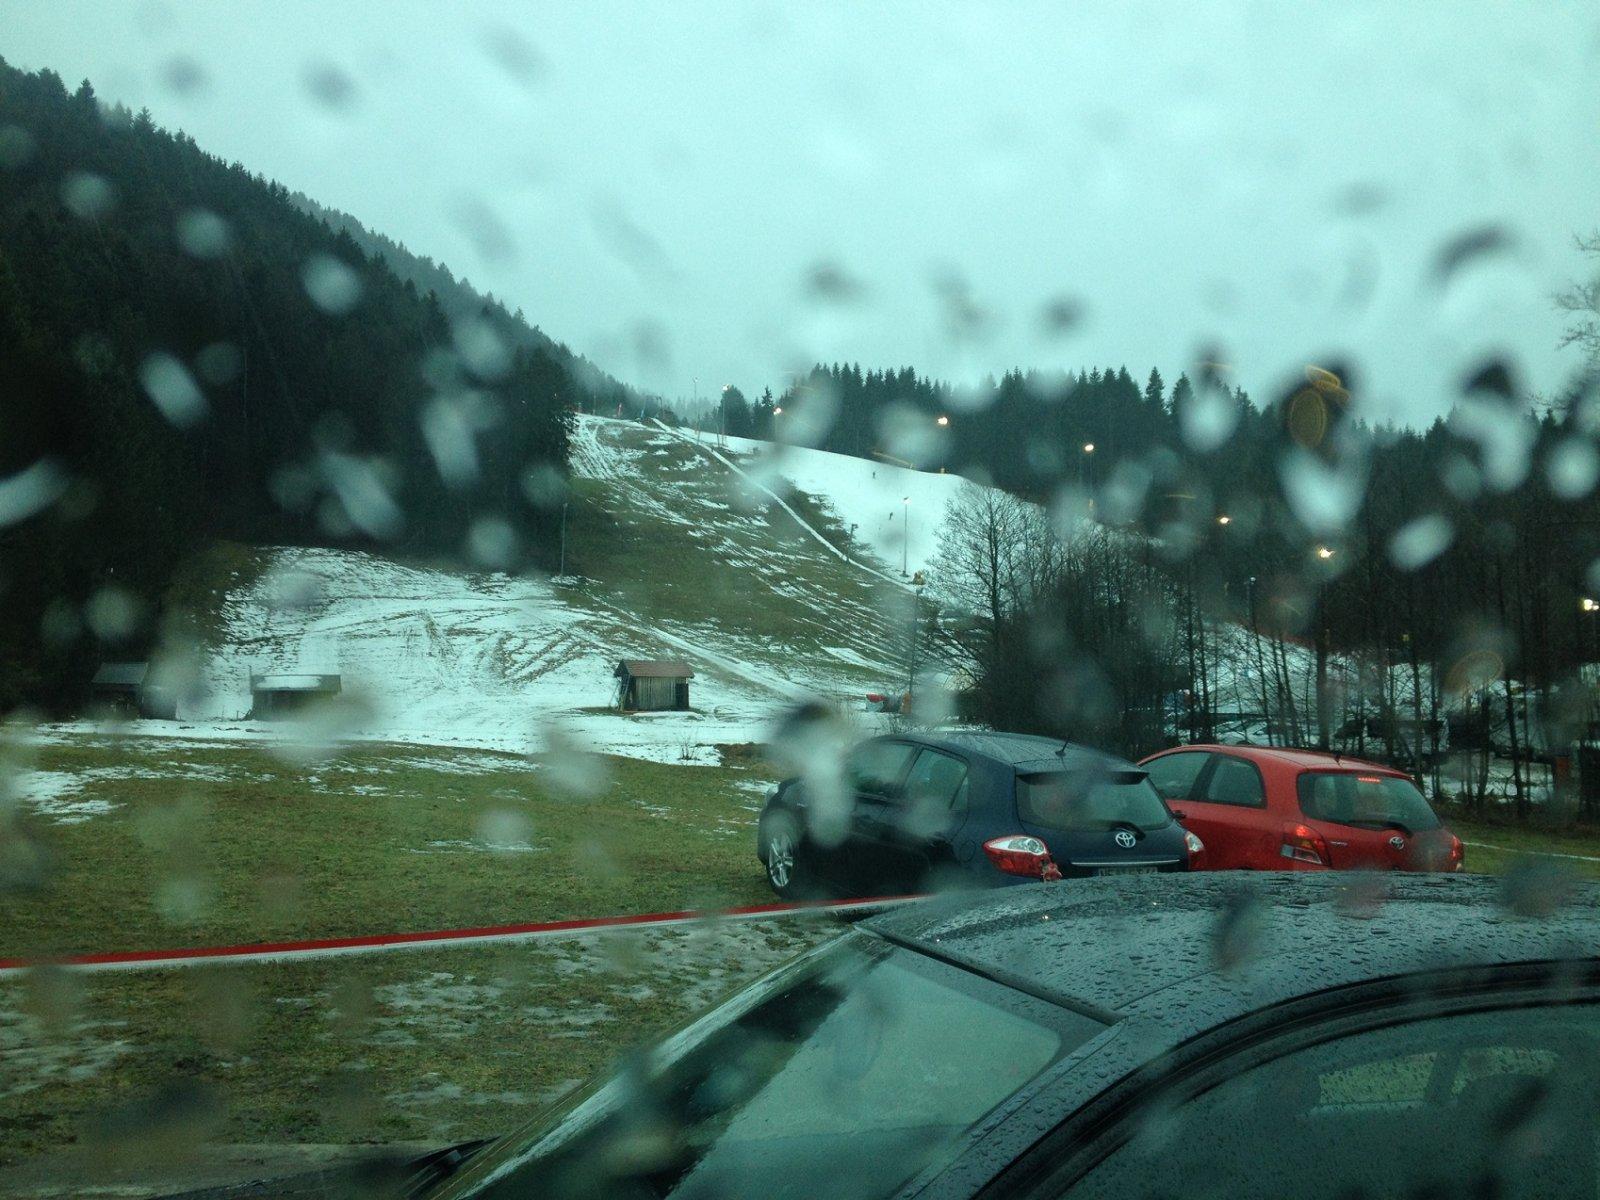 Lack of snow :(